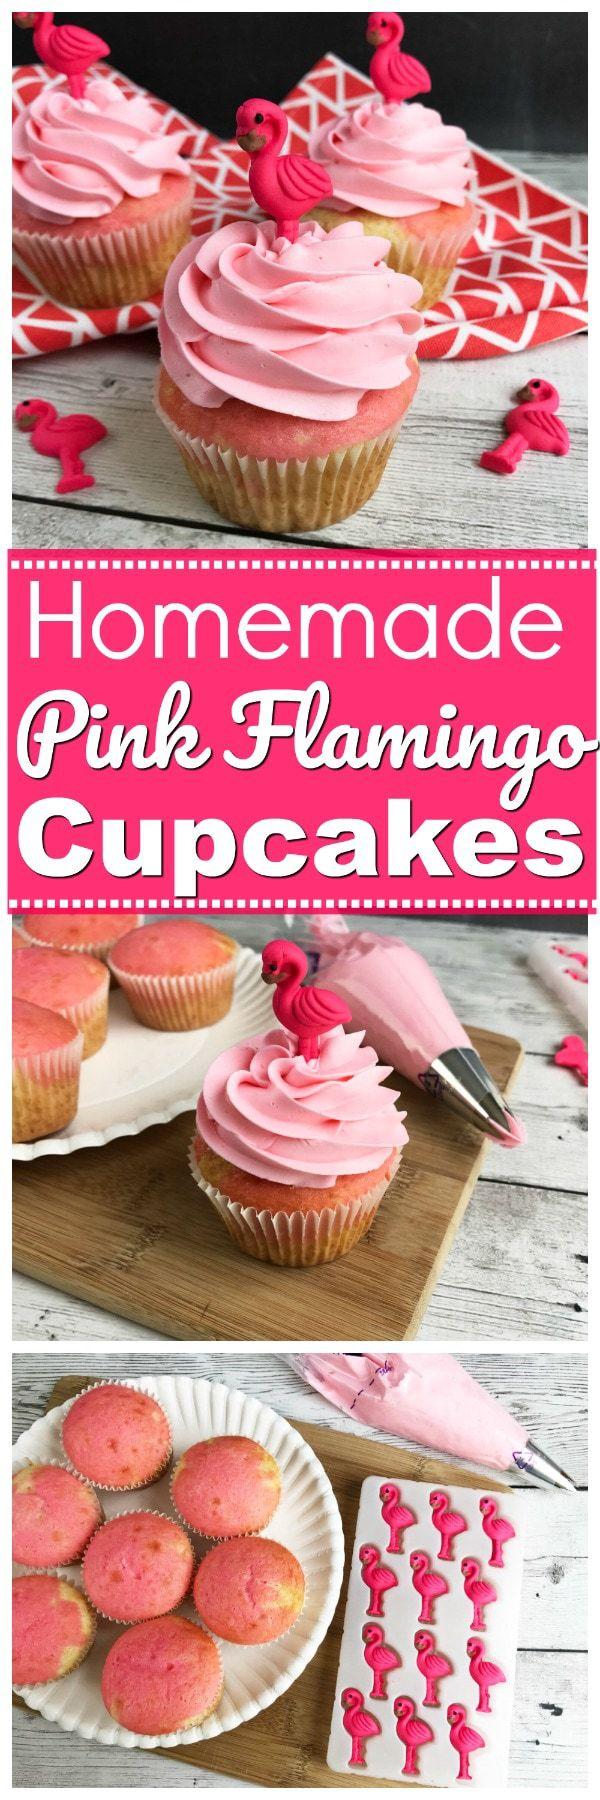 homemade flamingo cupcakes, Flamingo Cupcakes, Flamingo Desserts, pink flamingo cakes, pink flamingo birthday parties, beach themed birthday cupcakes, beach themed cupcakes, flamingo desserts, desserts with flamingos, cupcakes with flamingos, edible pink flamingo cupcake toppers